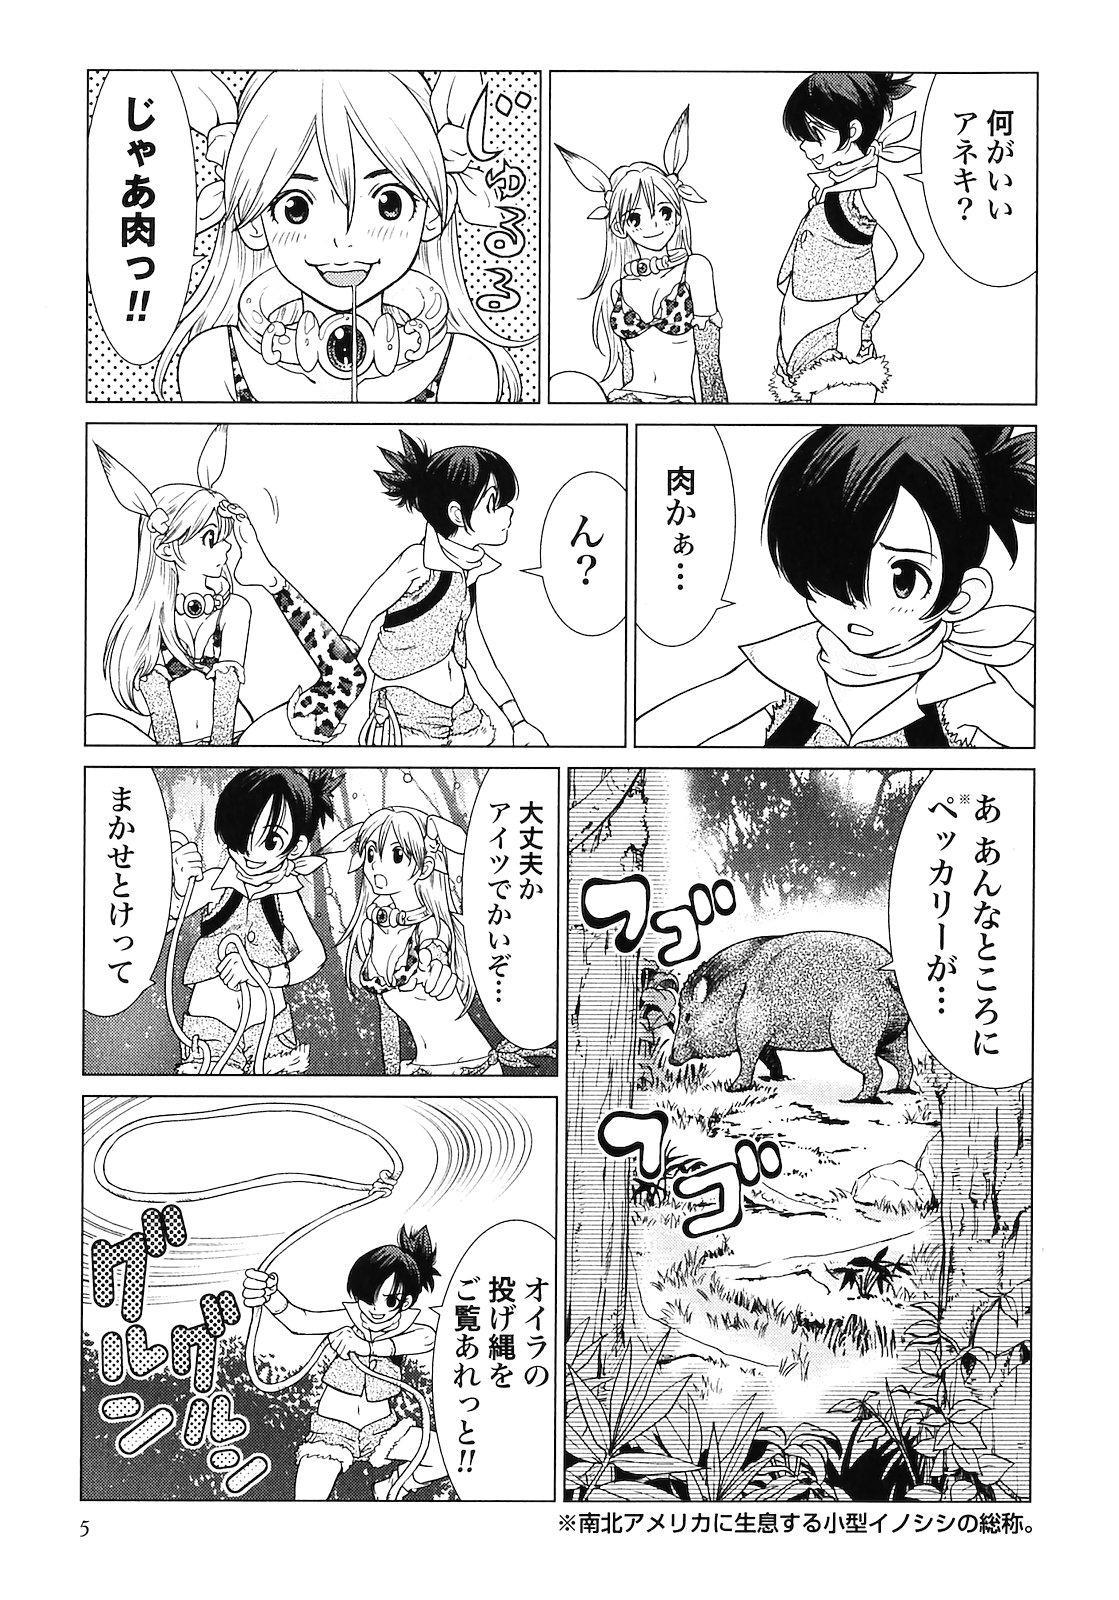 Makyo no Shanana Vol.02 6